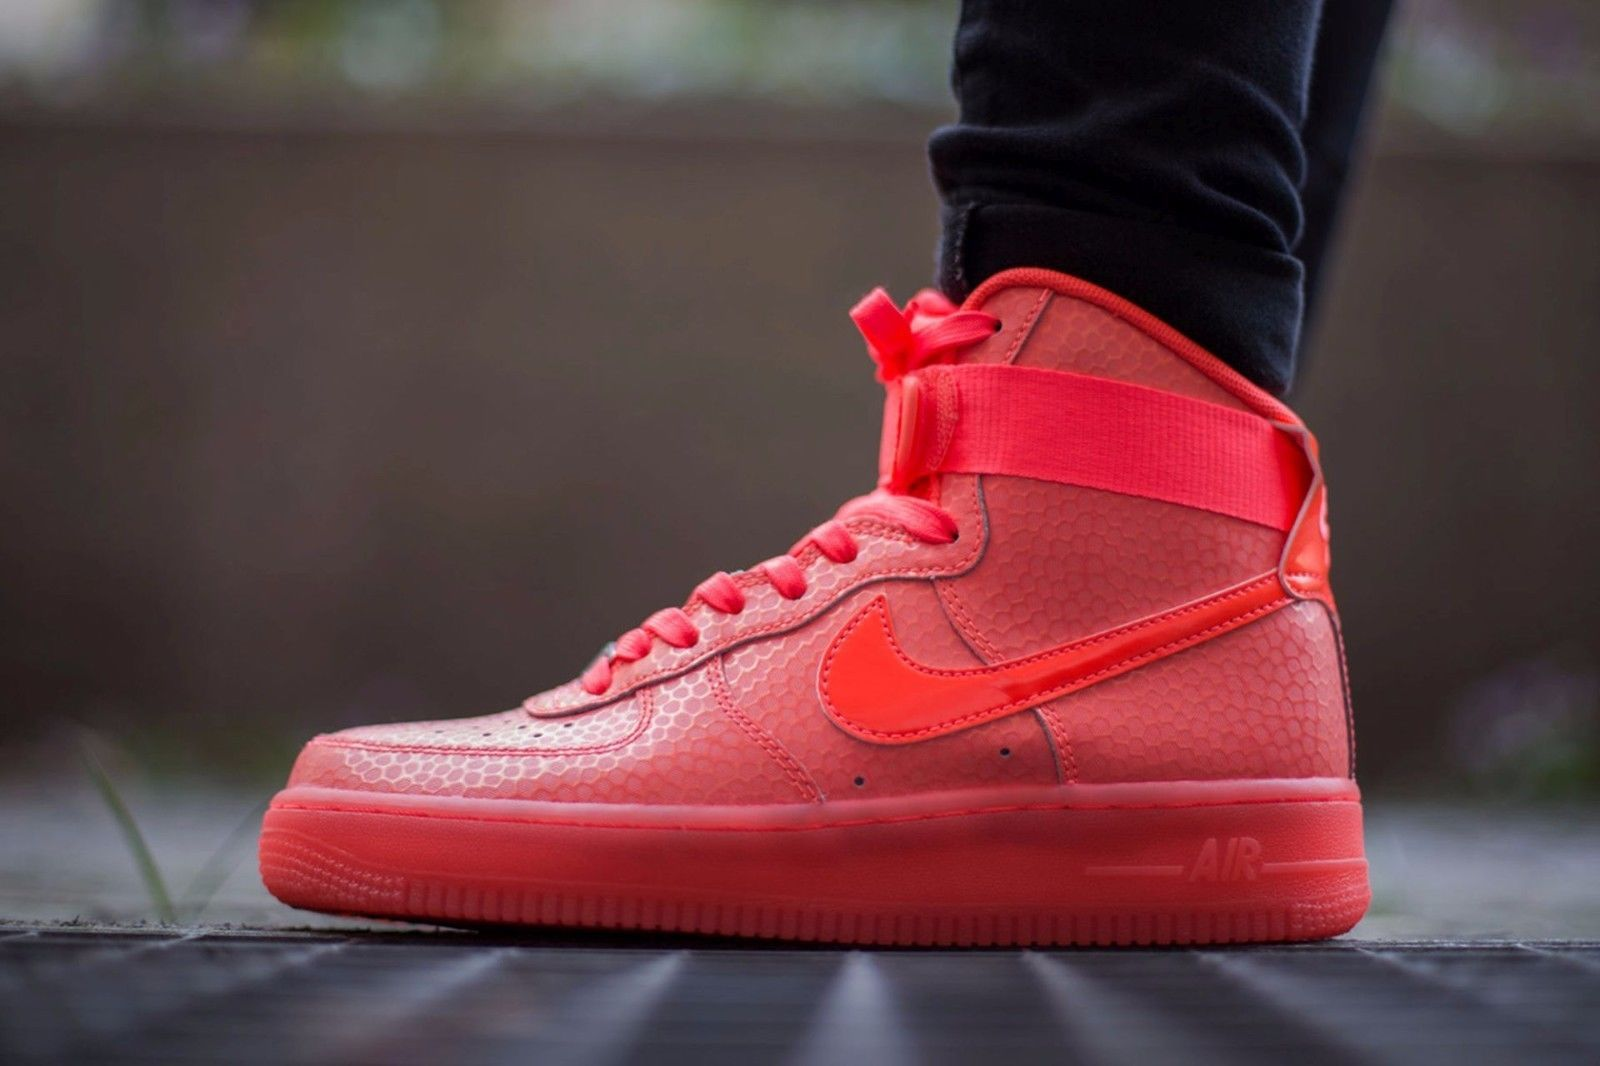 ca5fca8d22d4 Nike Air Force 1 Hi Premium Hot Lava Womens Shoes Size 9 654440-800 ...